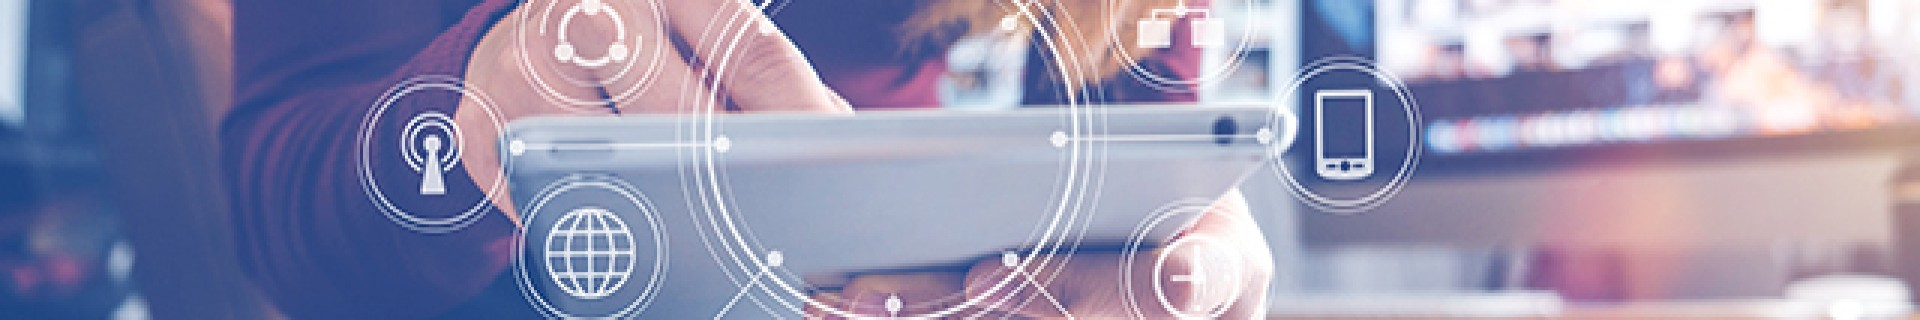 Маркетинг, продажби и бизнес в интернет